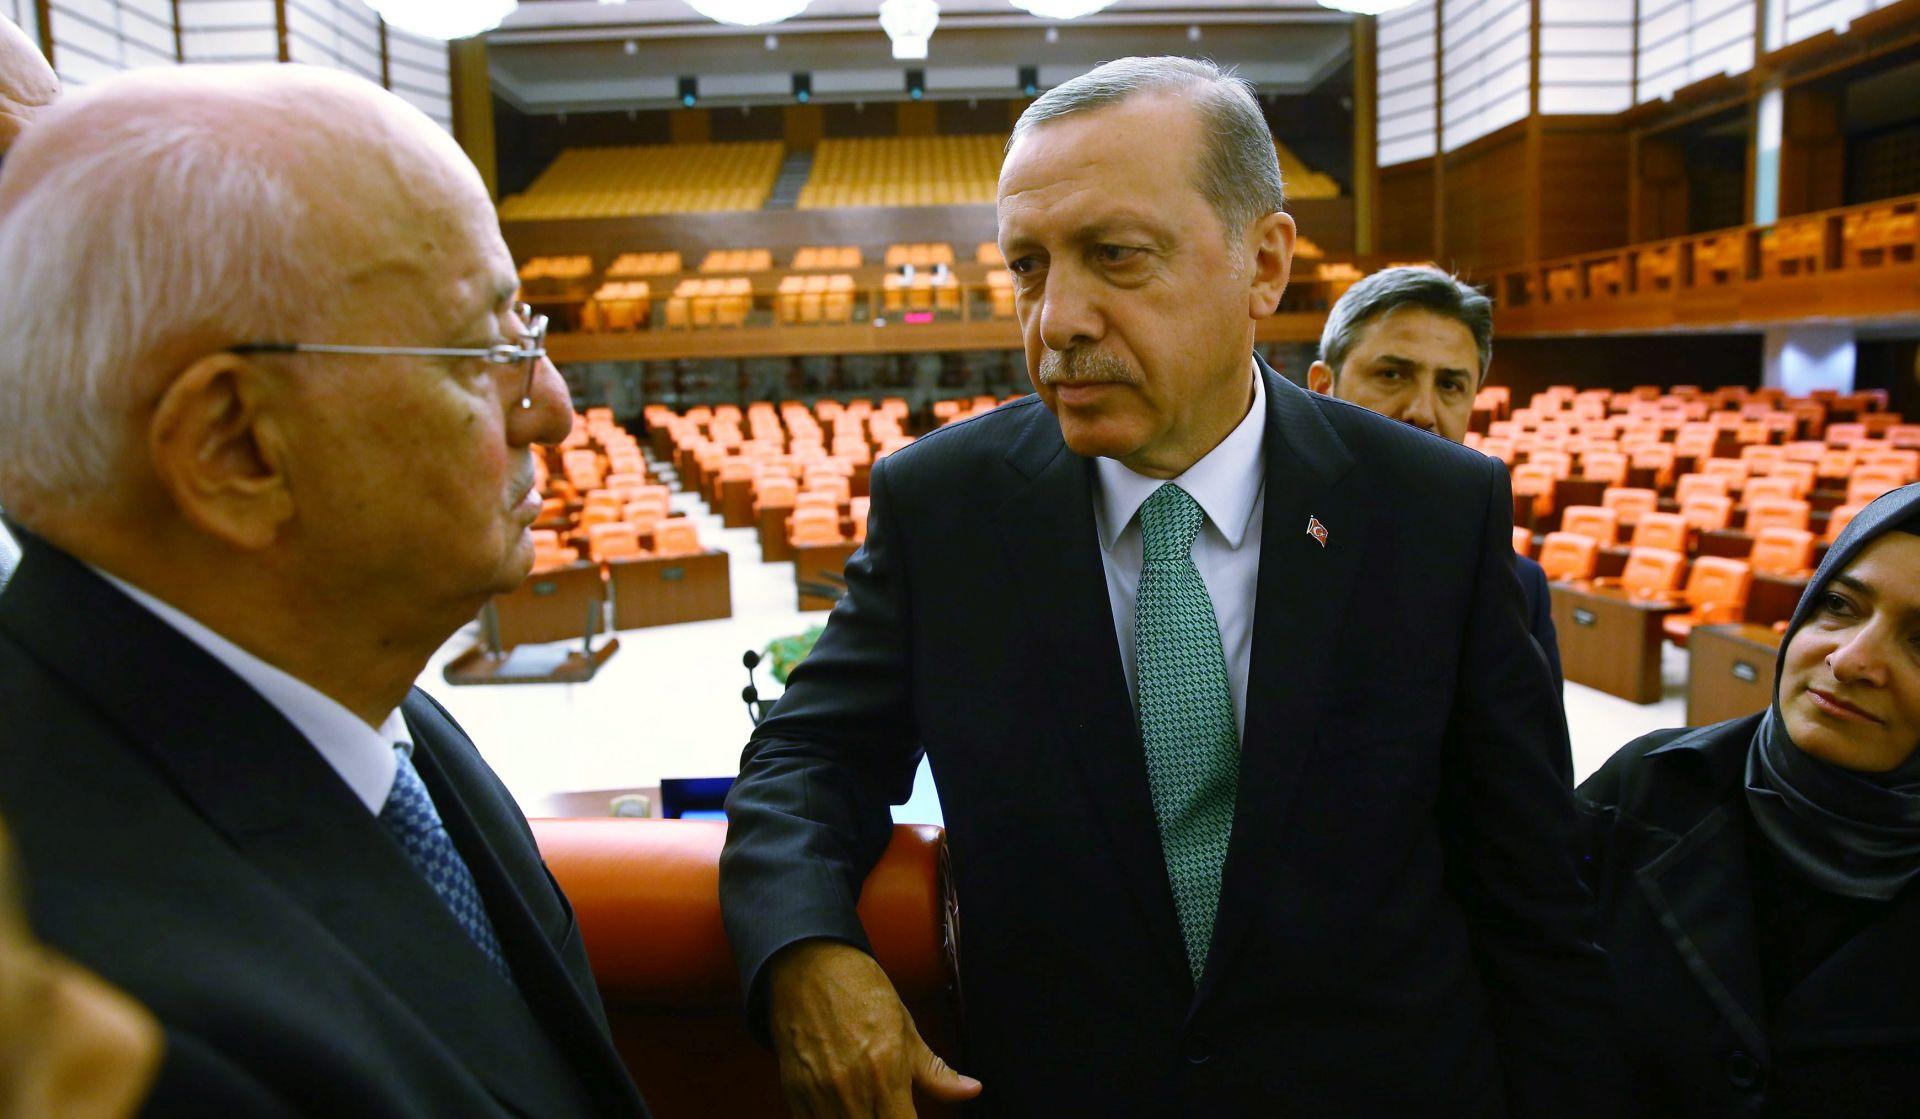 Uhićena ugladna turska novinarka Nazli Ilicak